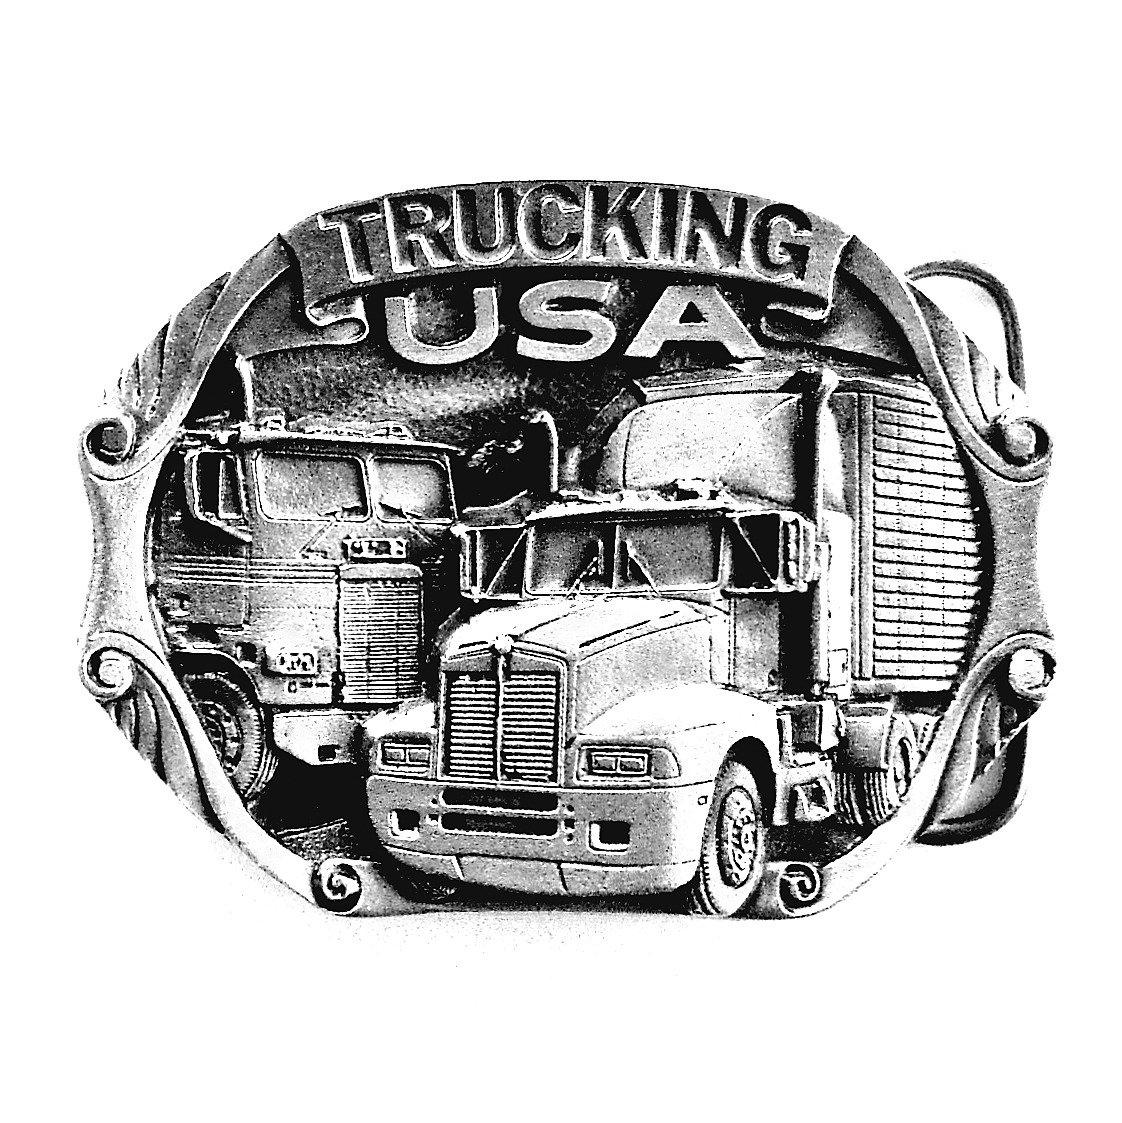 Trucking USA C&J Bergamot 1988 Solid Pewter Belt Buckle